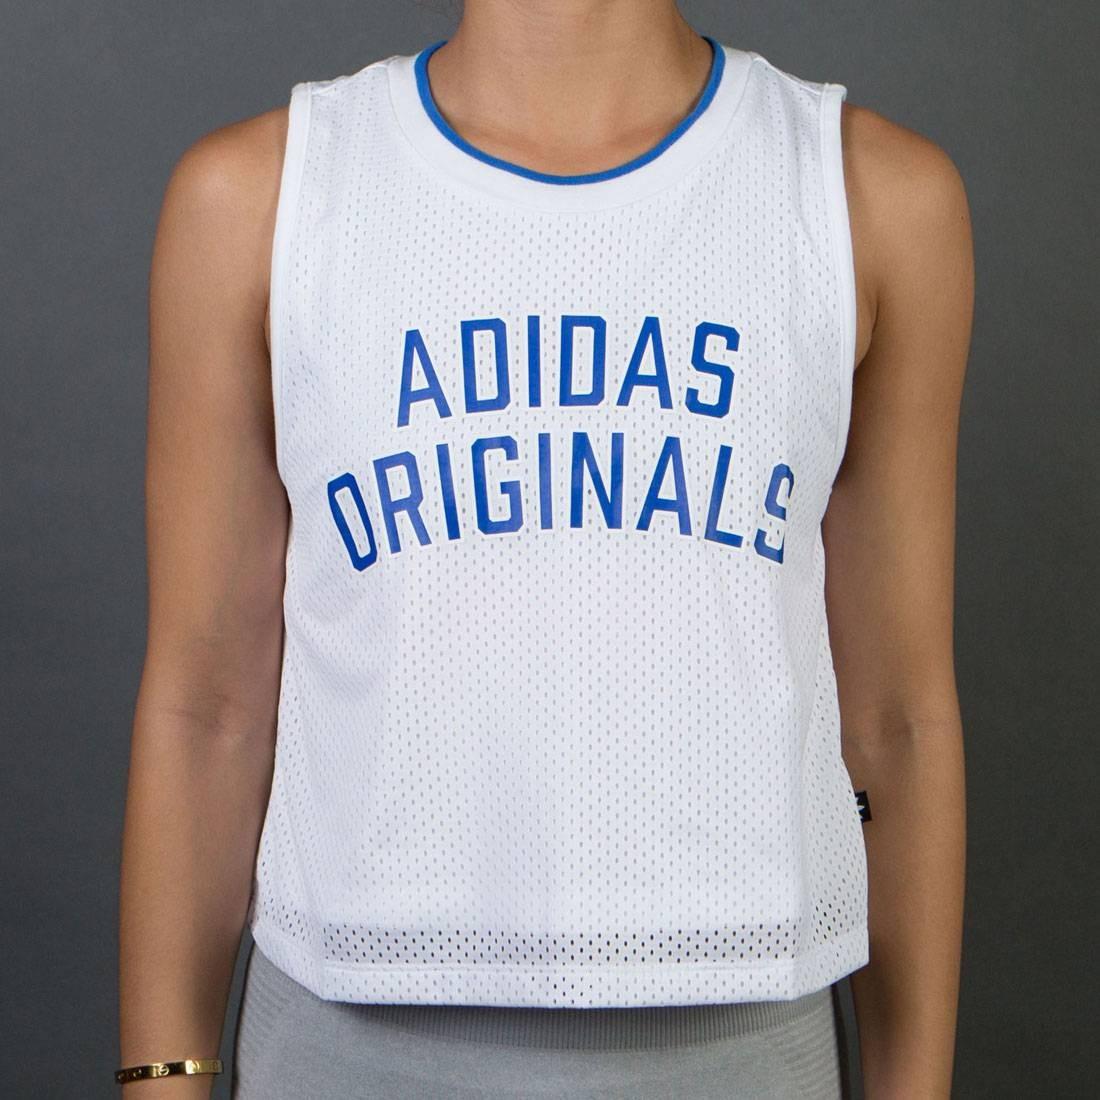 Adidas Women Adidas Original Tan Top T-Shirt (white)